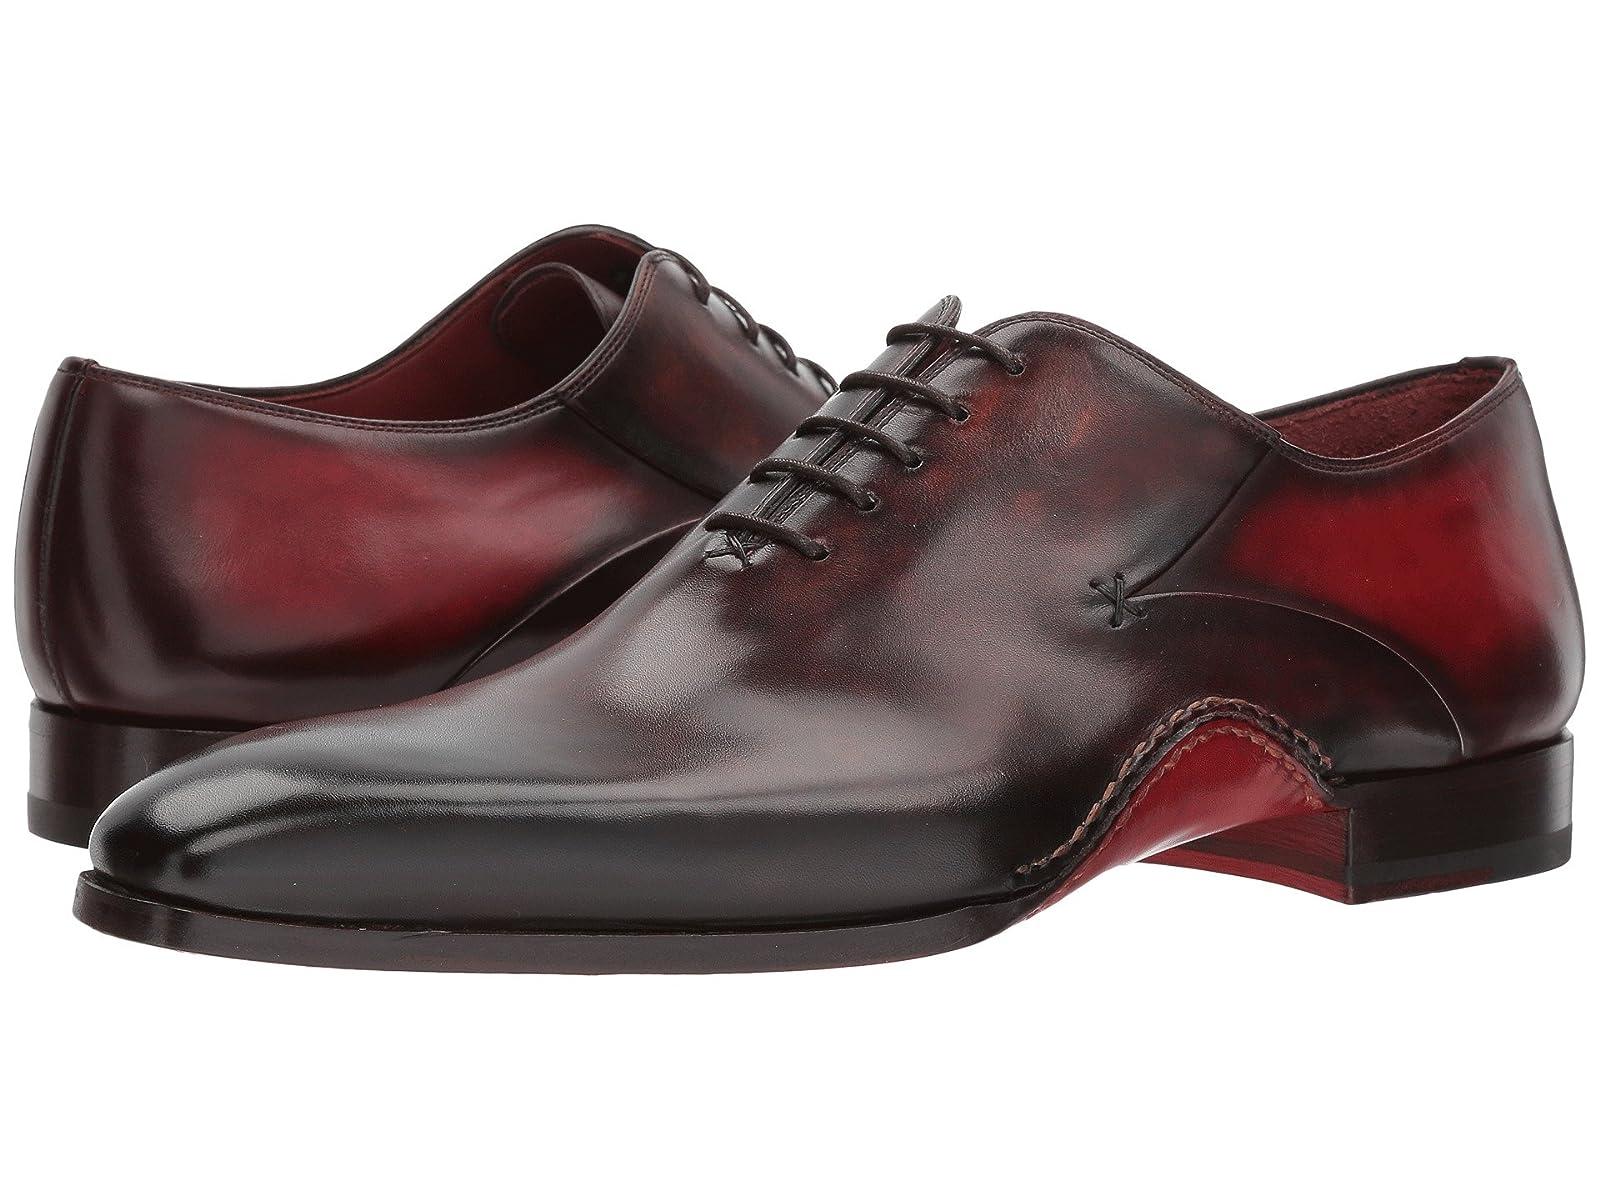 Magnanni CantabriaAtmospheric grades have affordable shoes